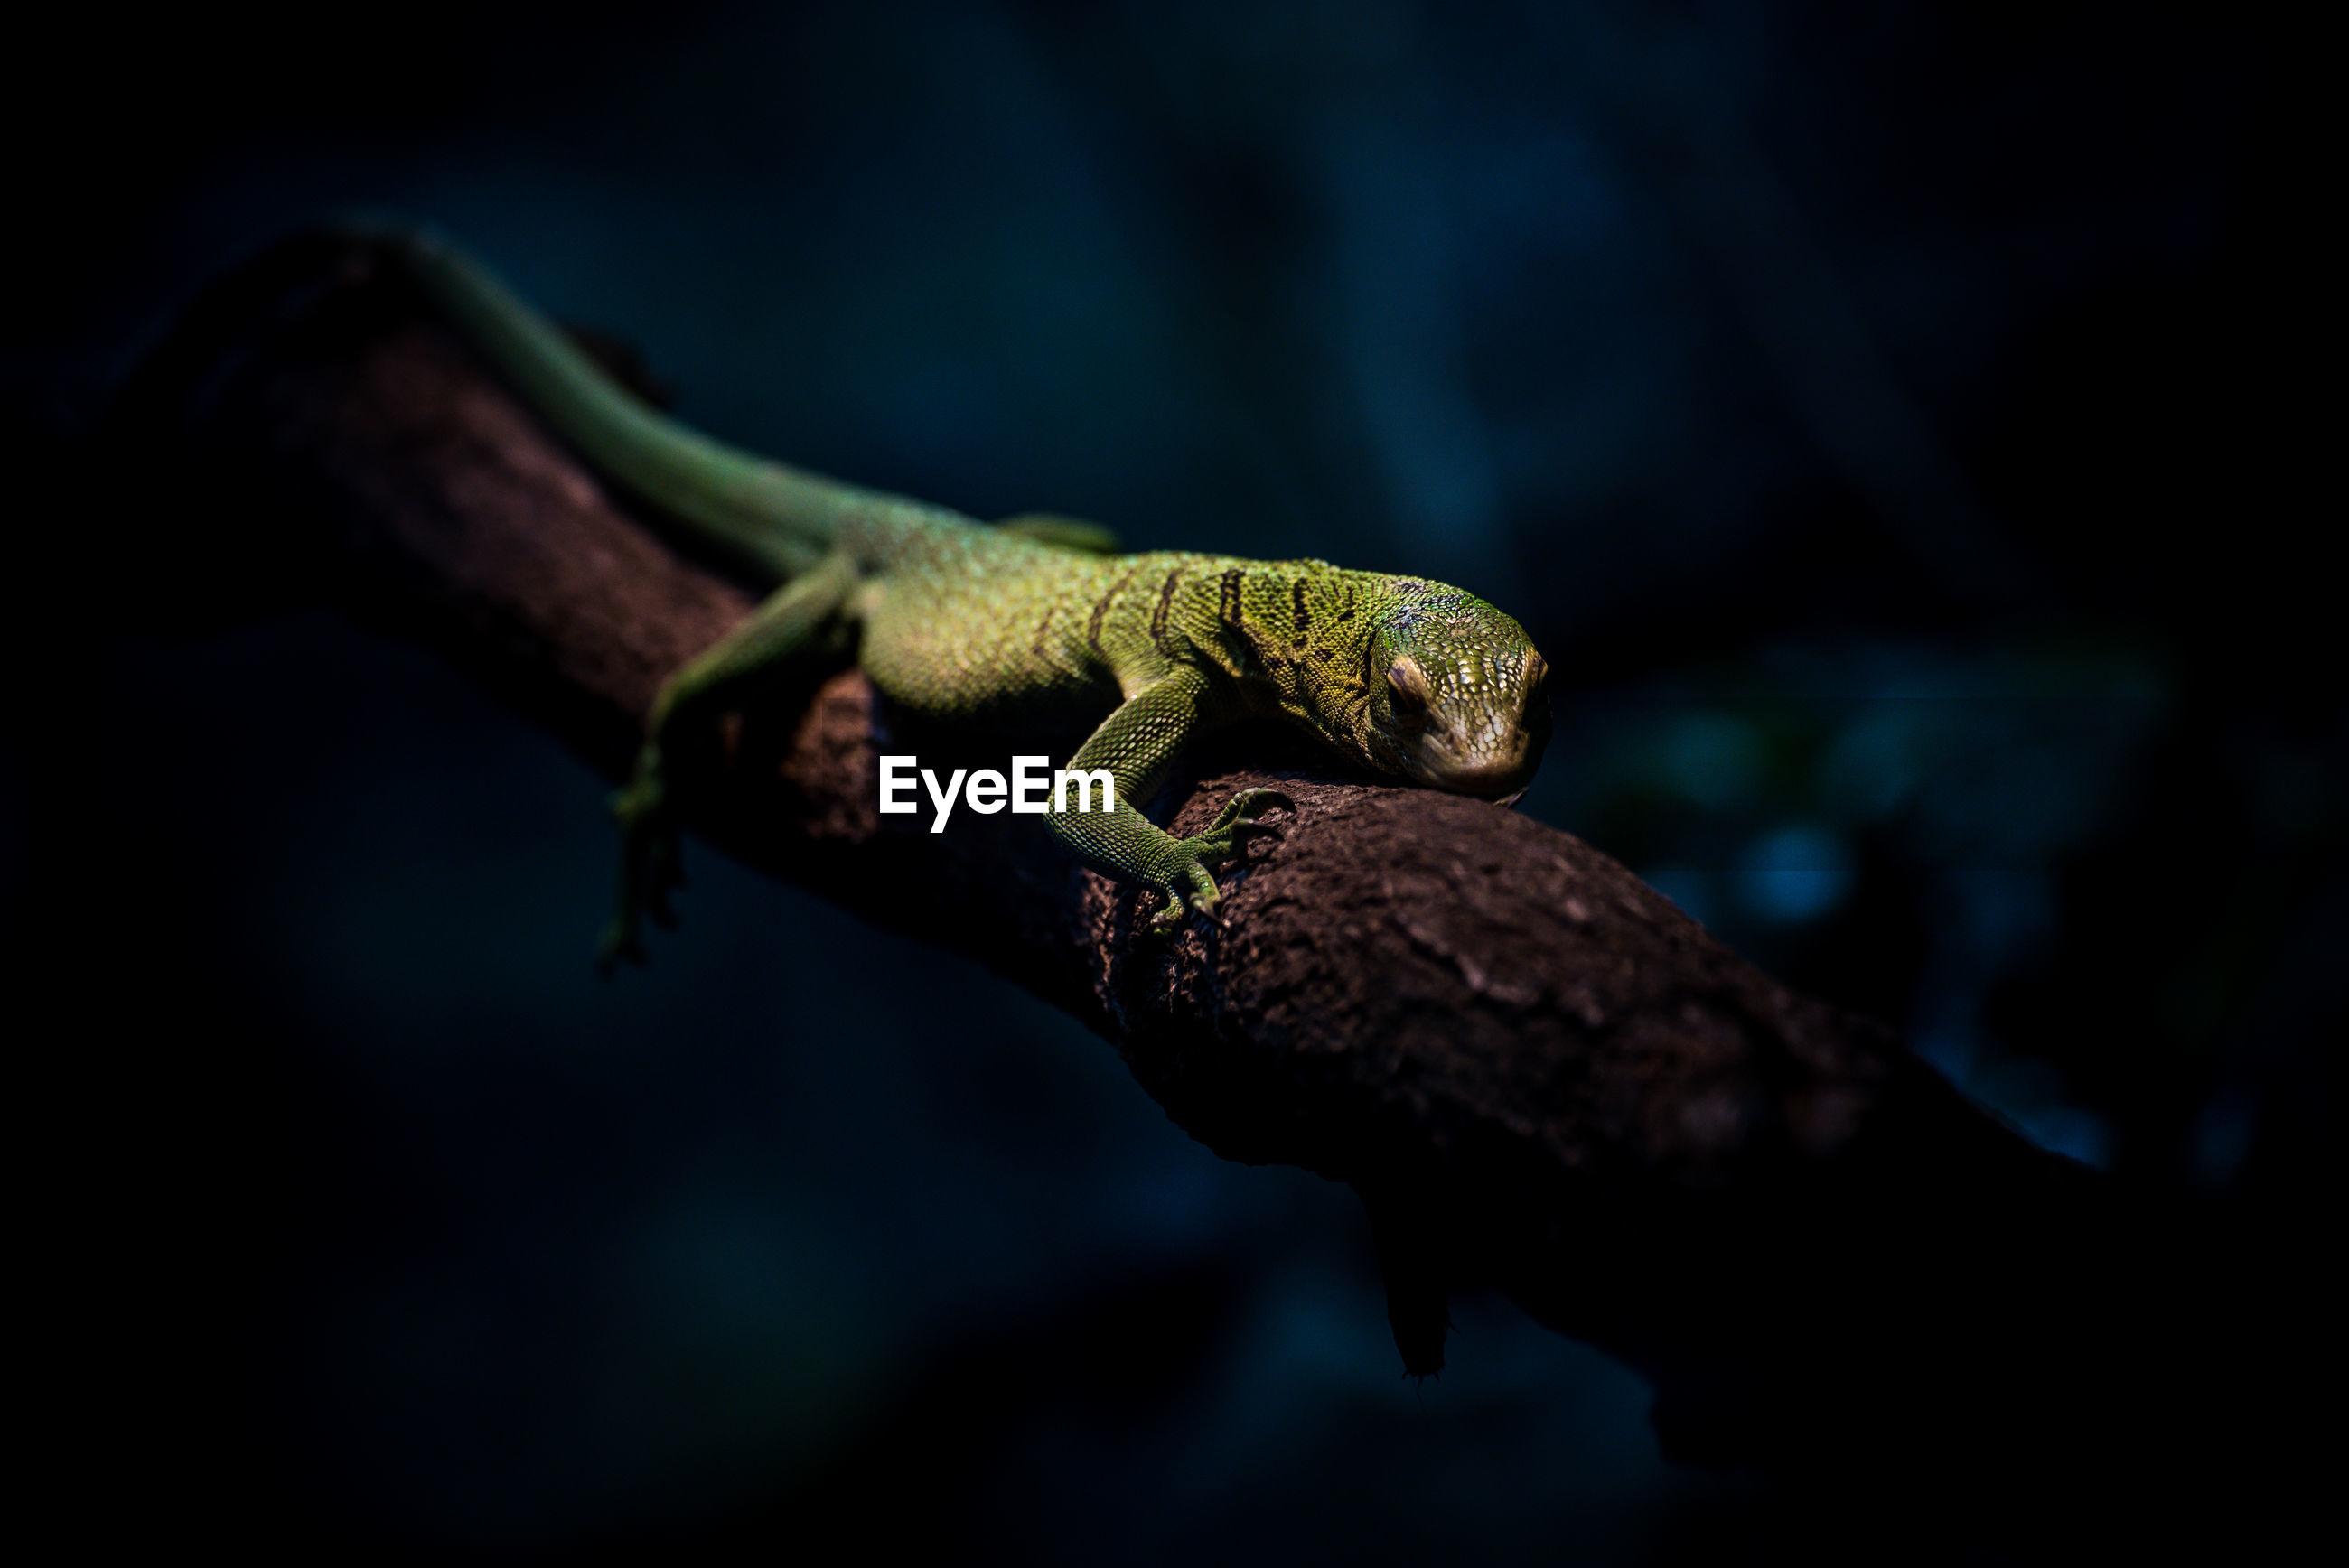 Close-up of lizard on tree at night